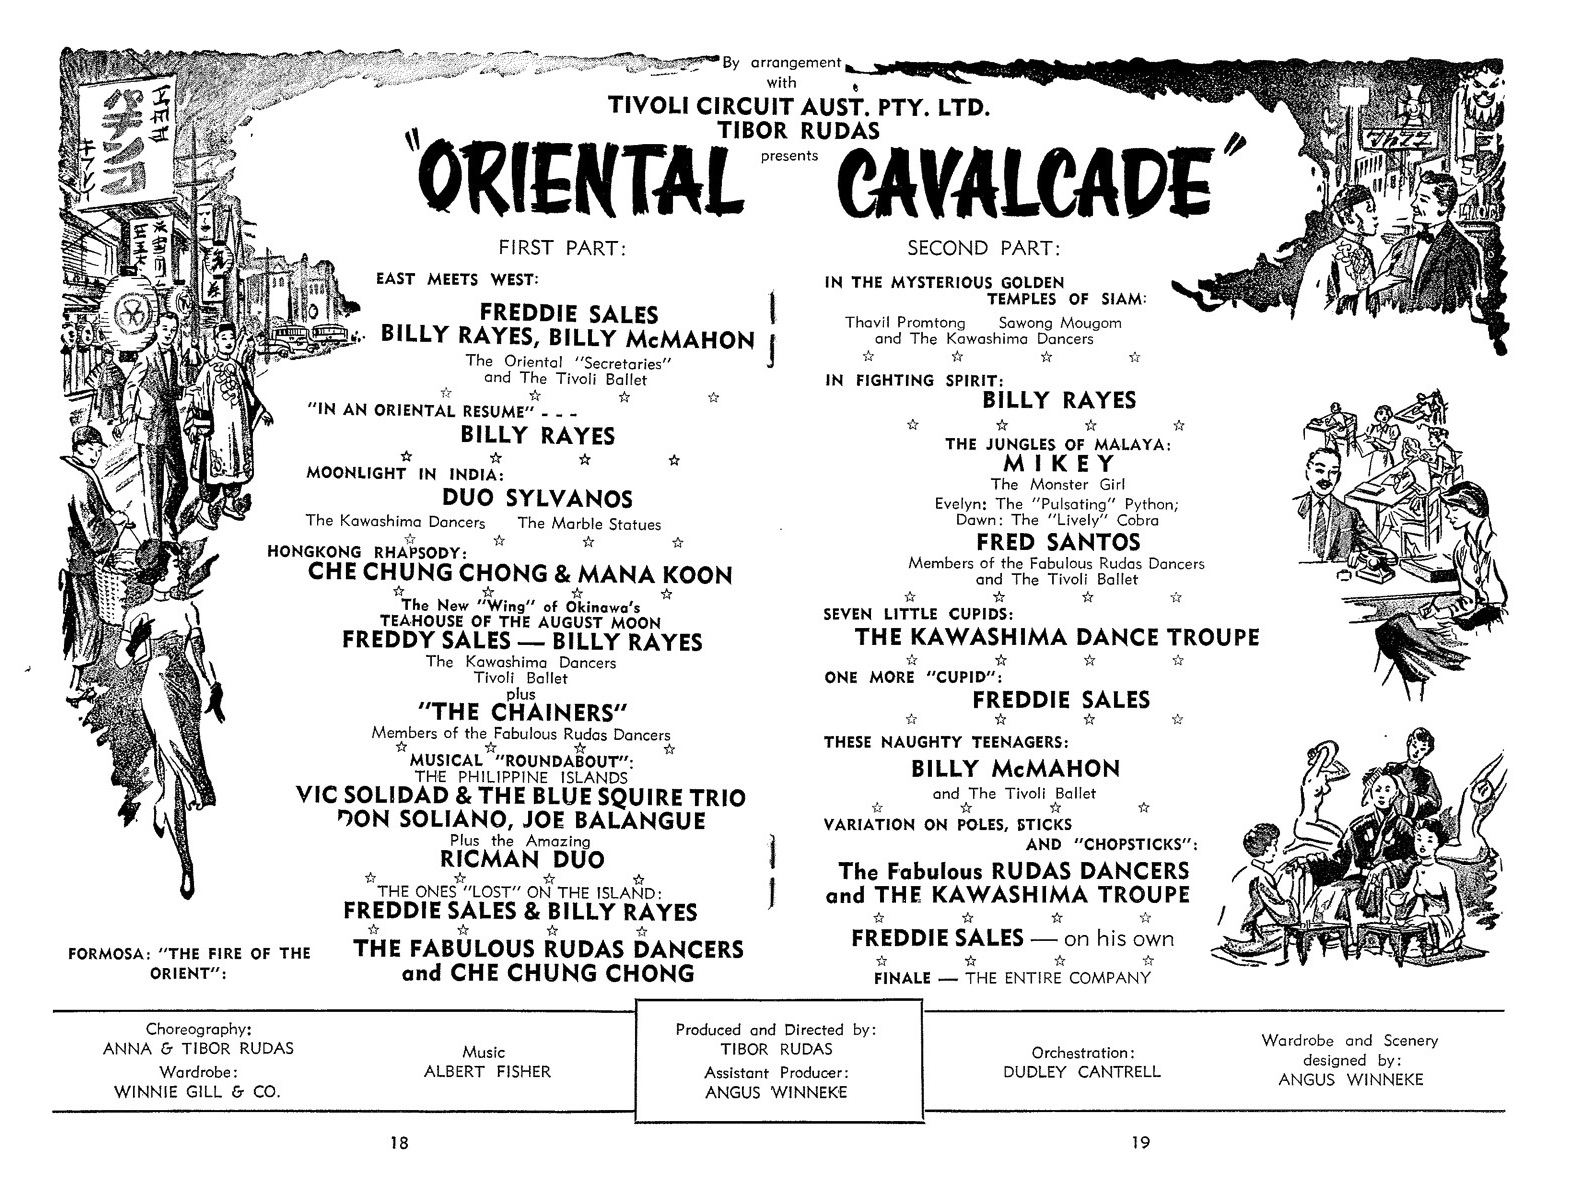 OrientalCavalcade4